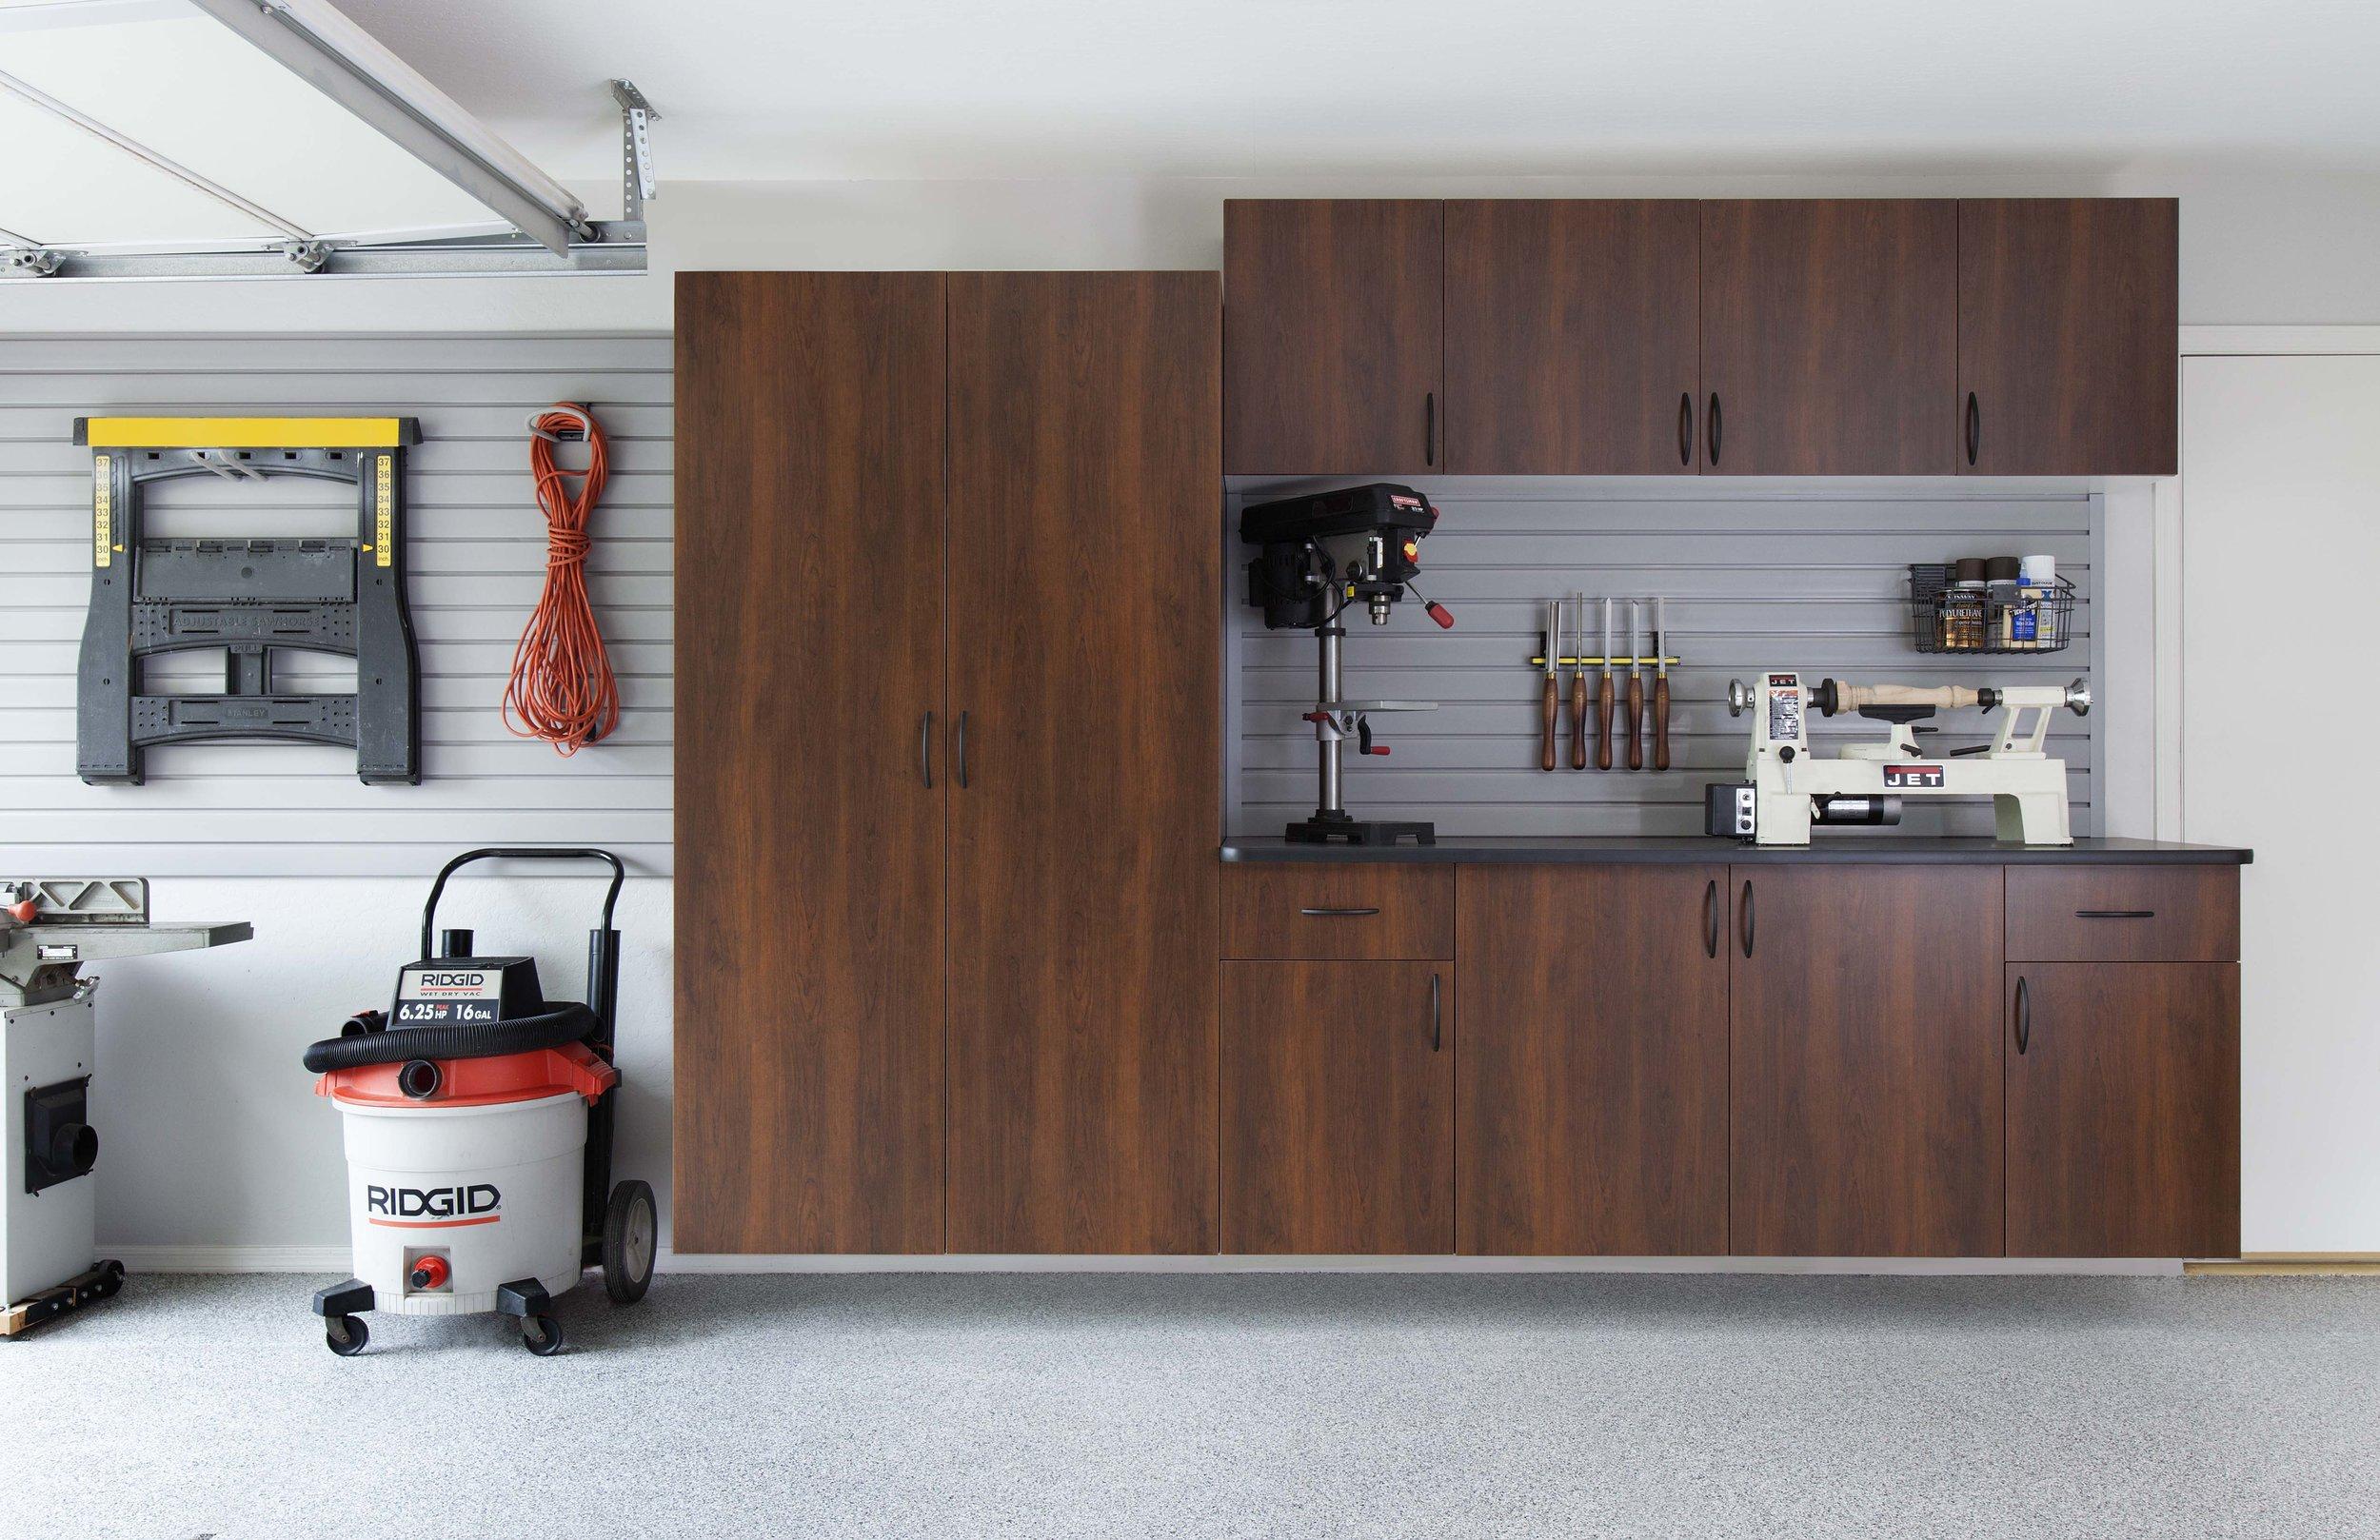 Coco Cabinets-Arch Pulls-Ebony Counter-Slatwall-Smoke Floor-Fetch-Sep 2013.jpg